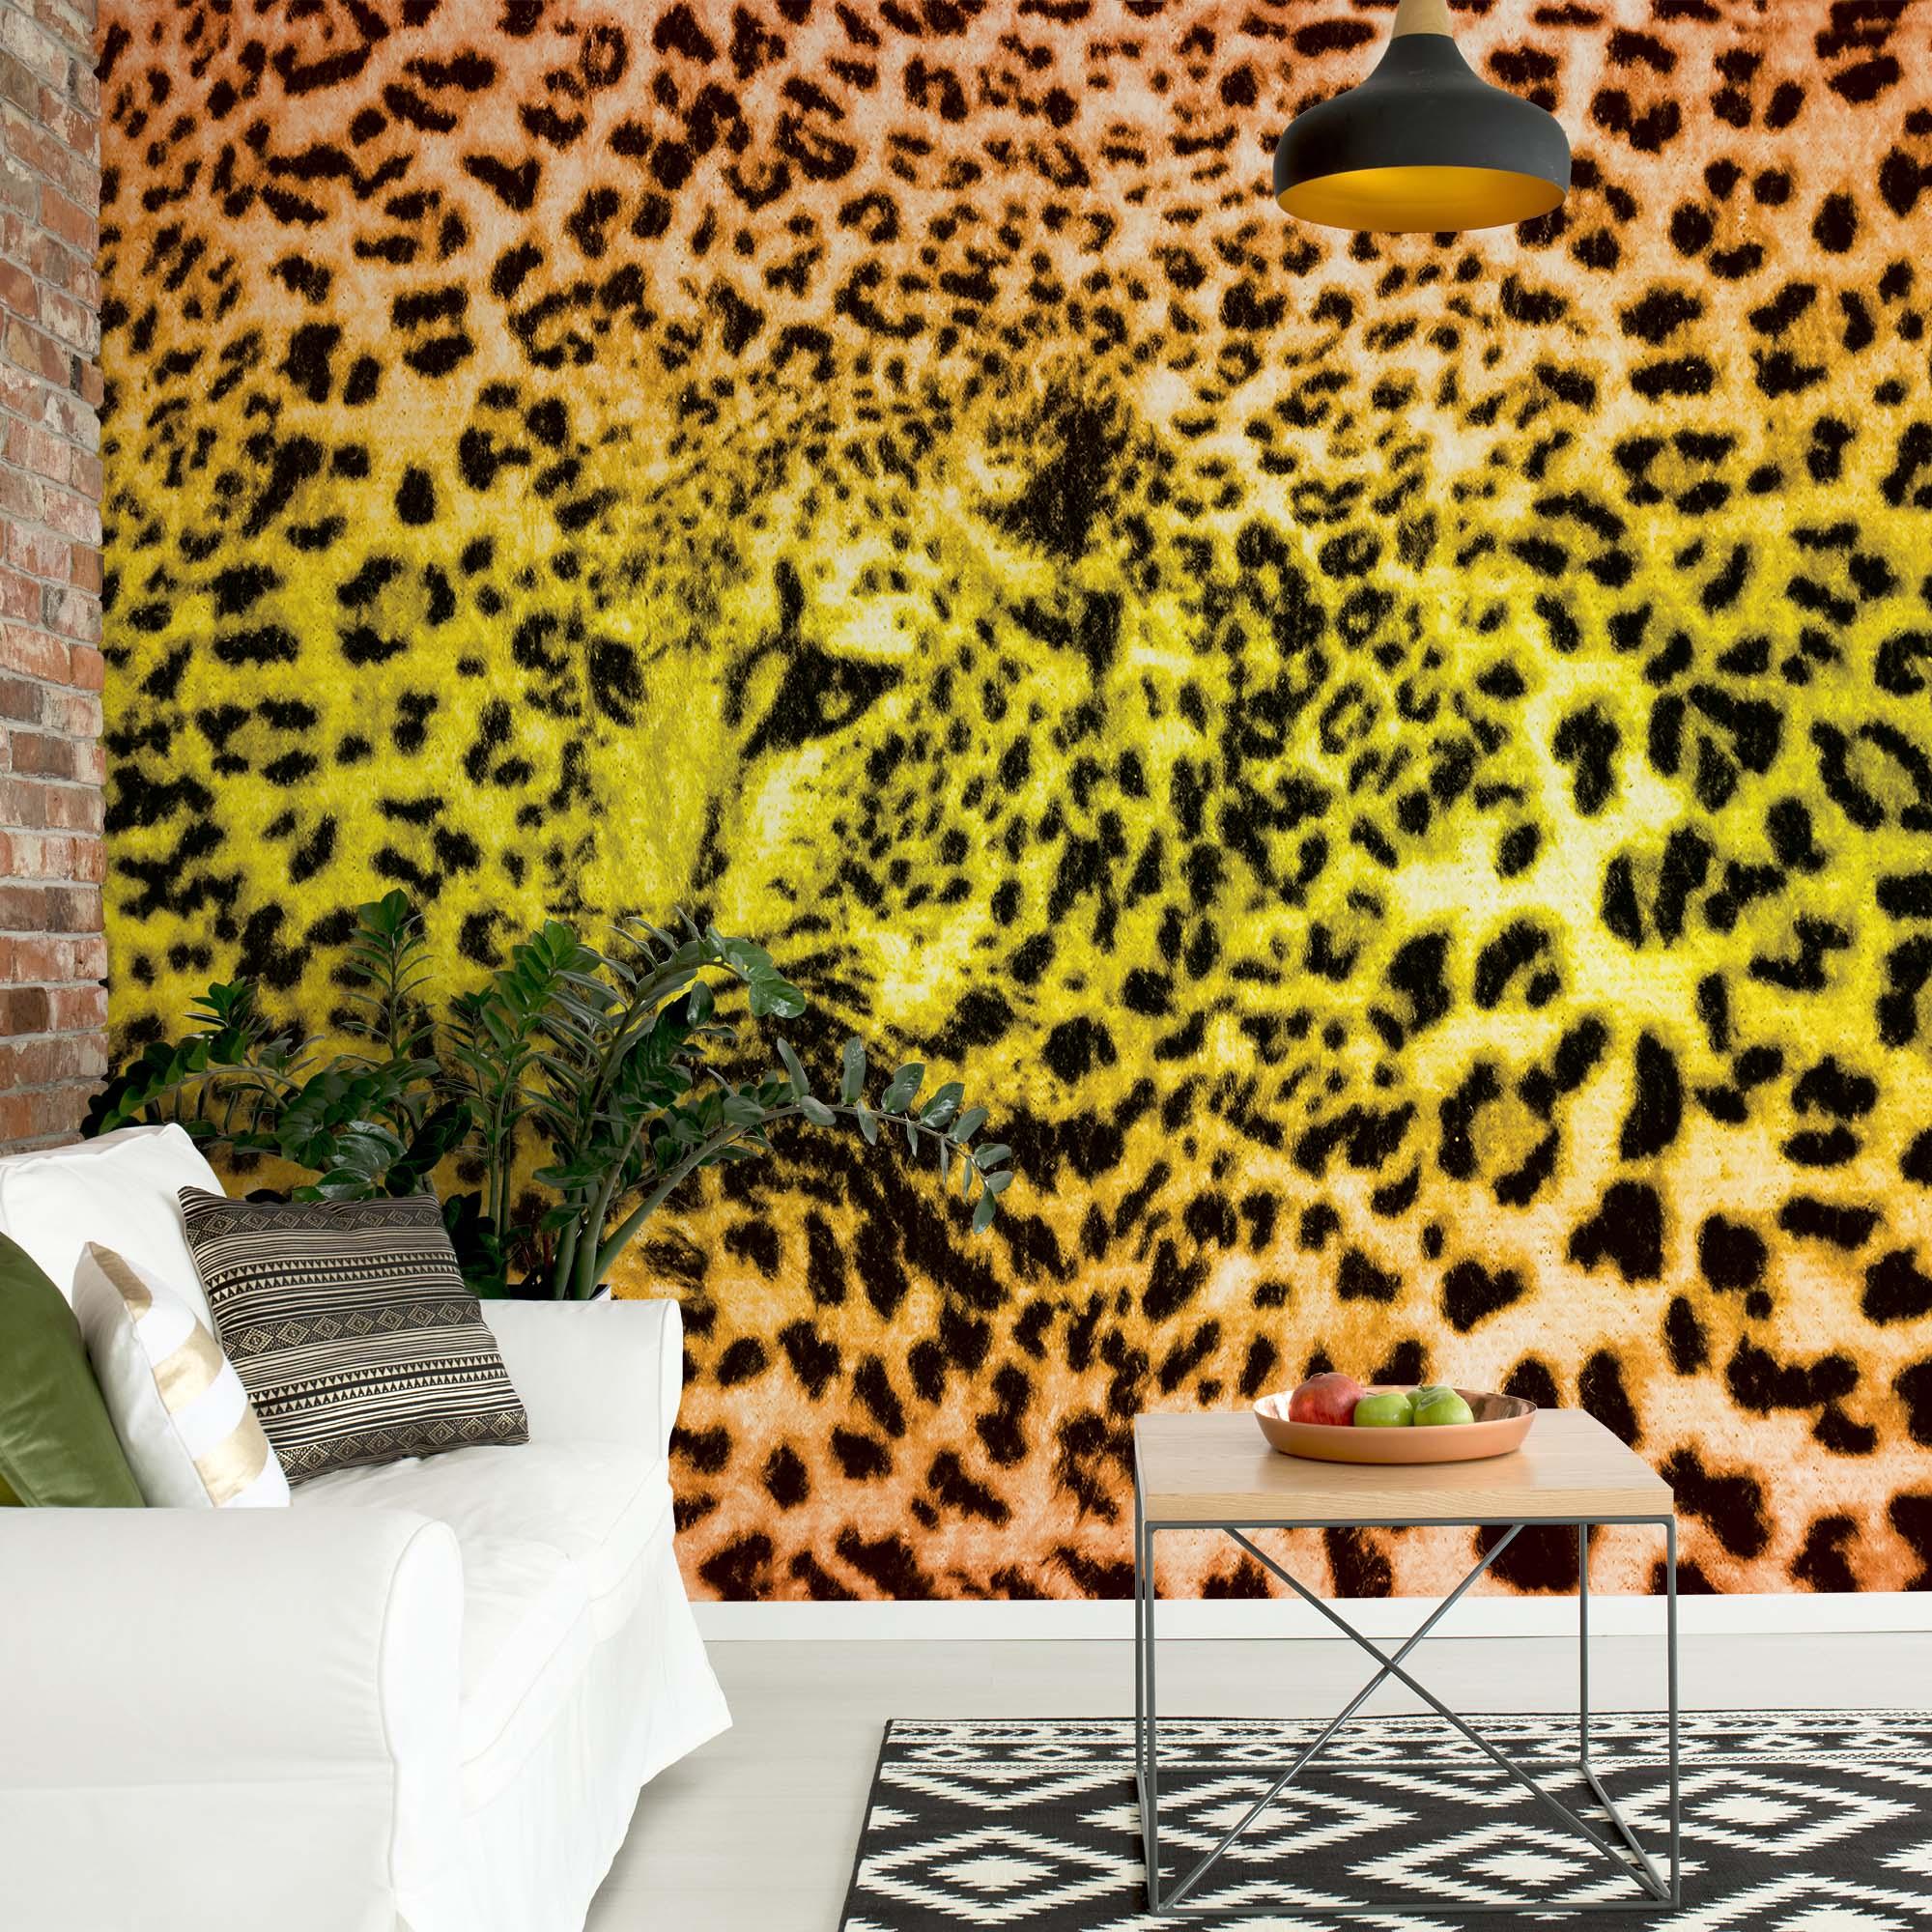 Leopard Animals Living Themes